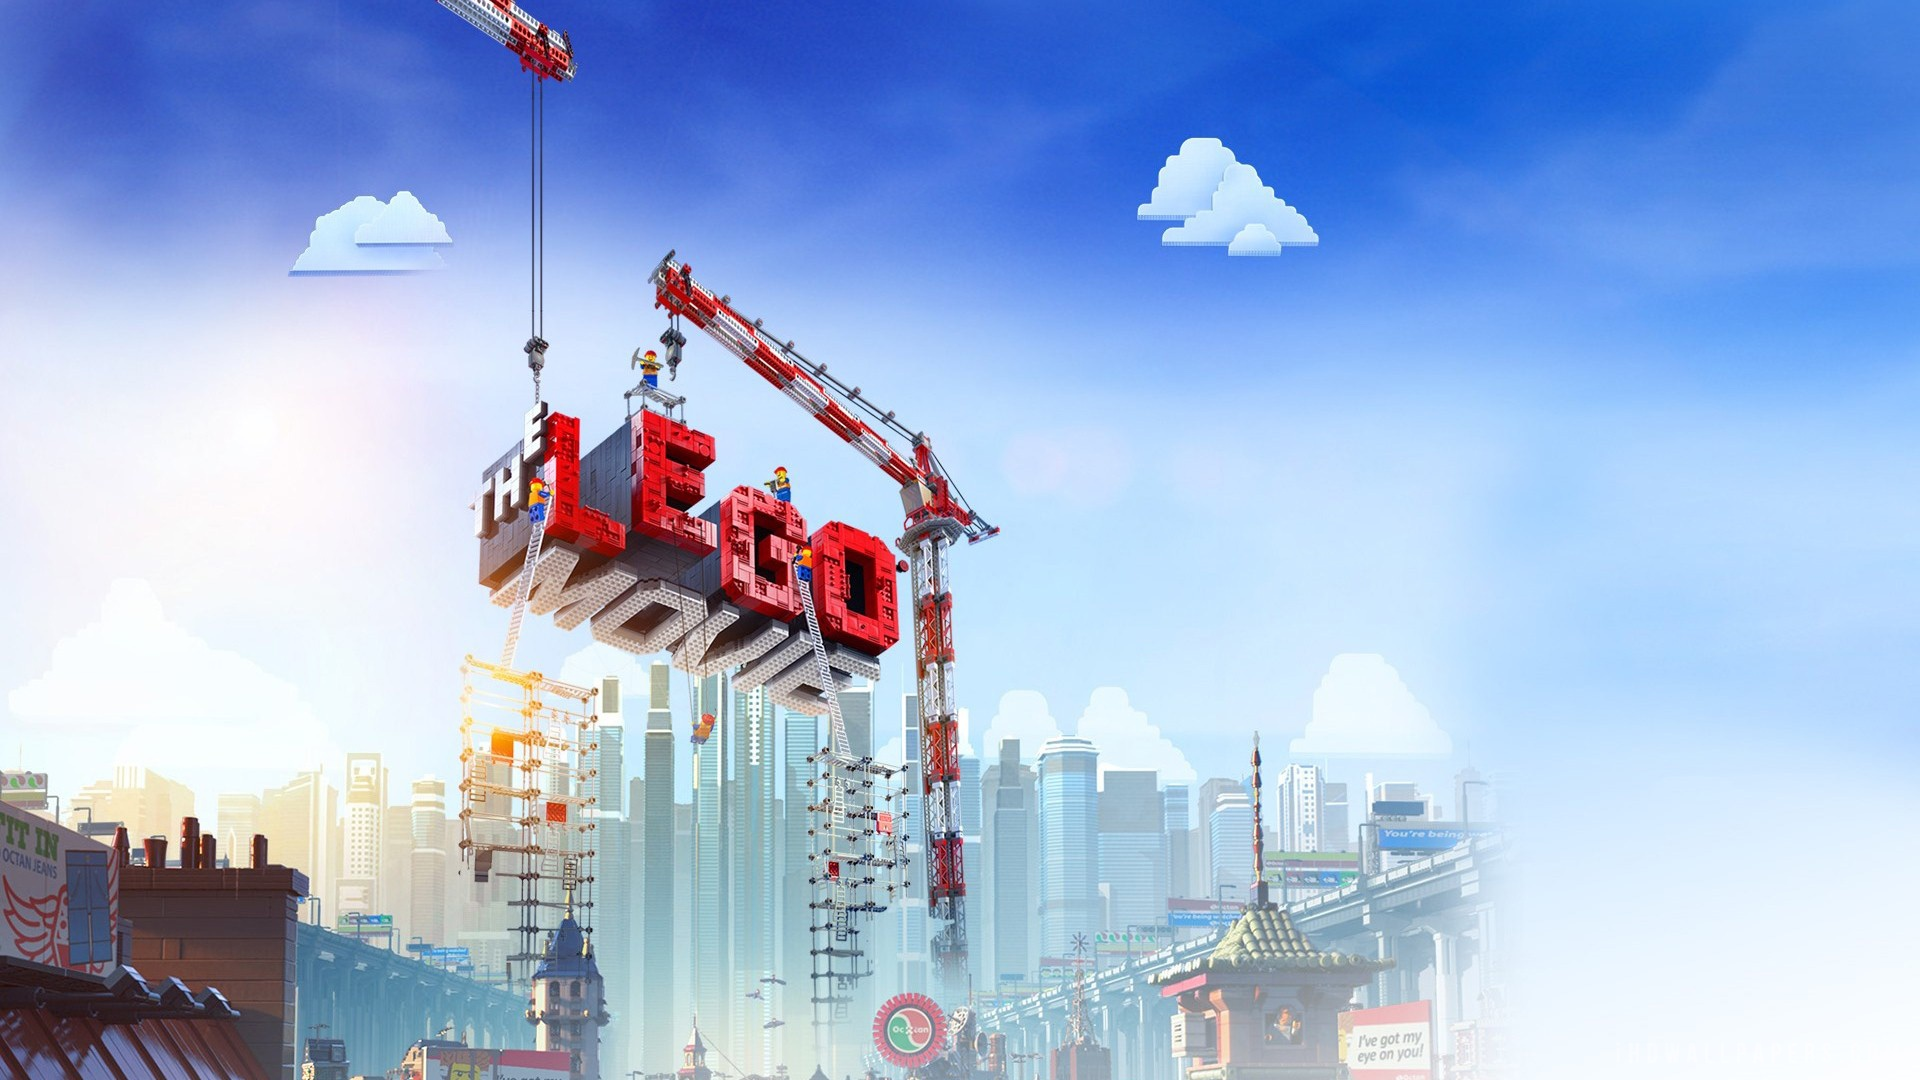 The Lego Movie wallpaper 2